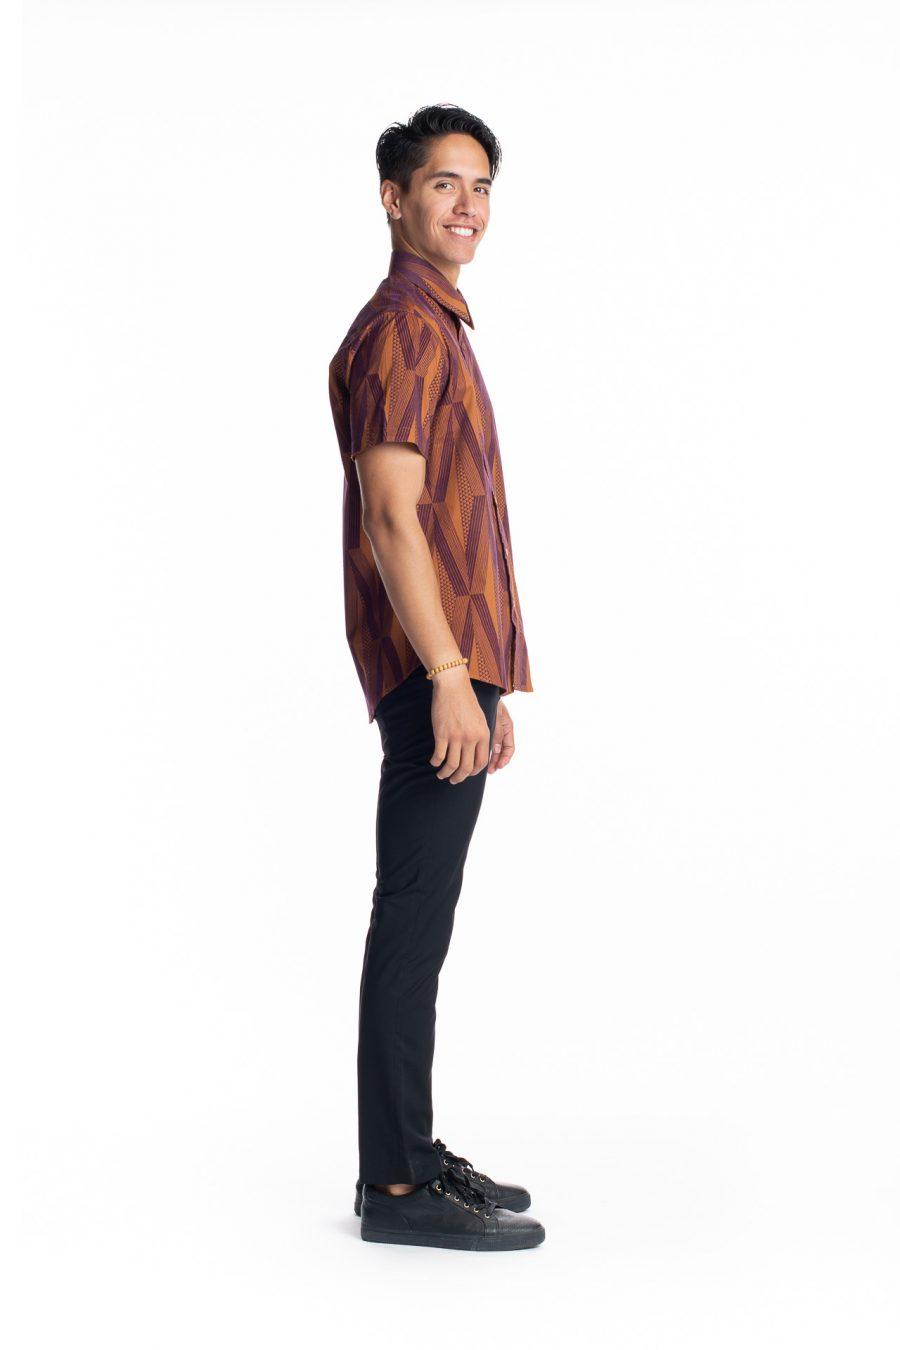 Male model wearing Aloha Short Sleeve in Mahagony Mustard Kanaloa - Side View